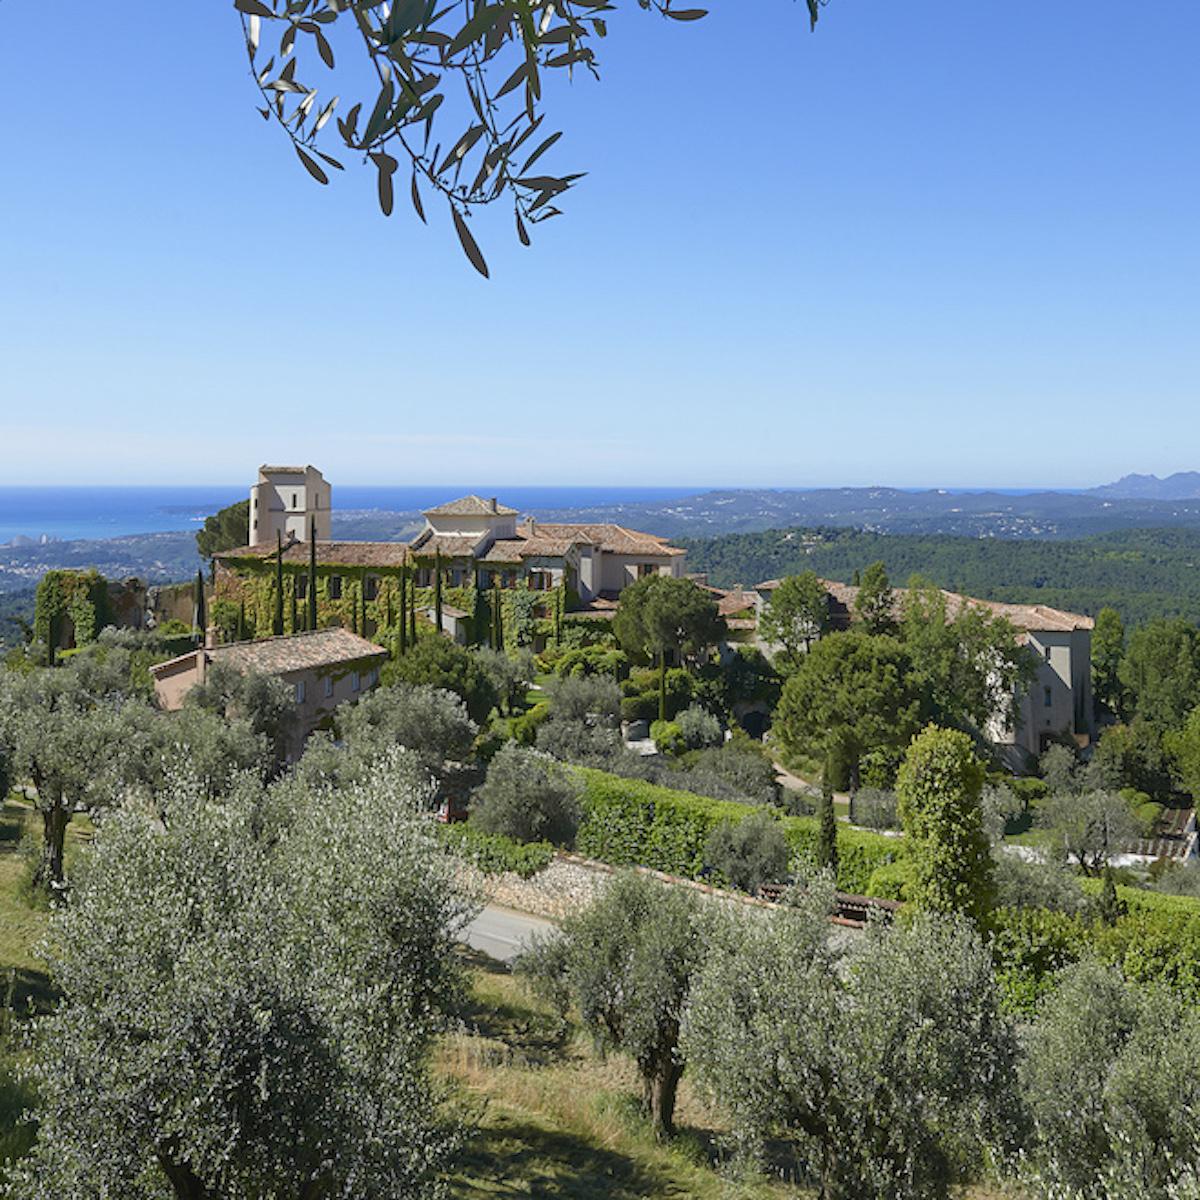 Château Saint-Martin & Spa in the surrounding landscape, Lacave, France